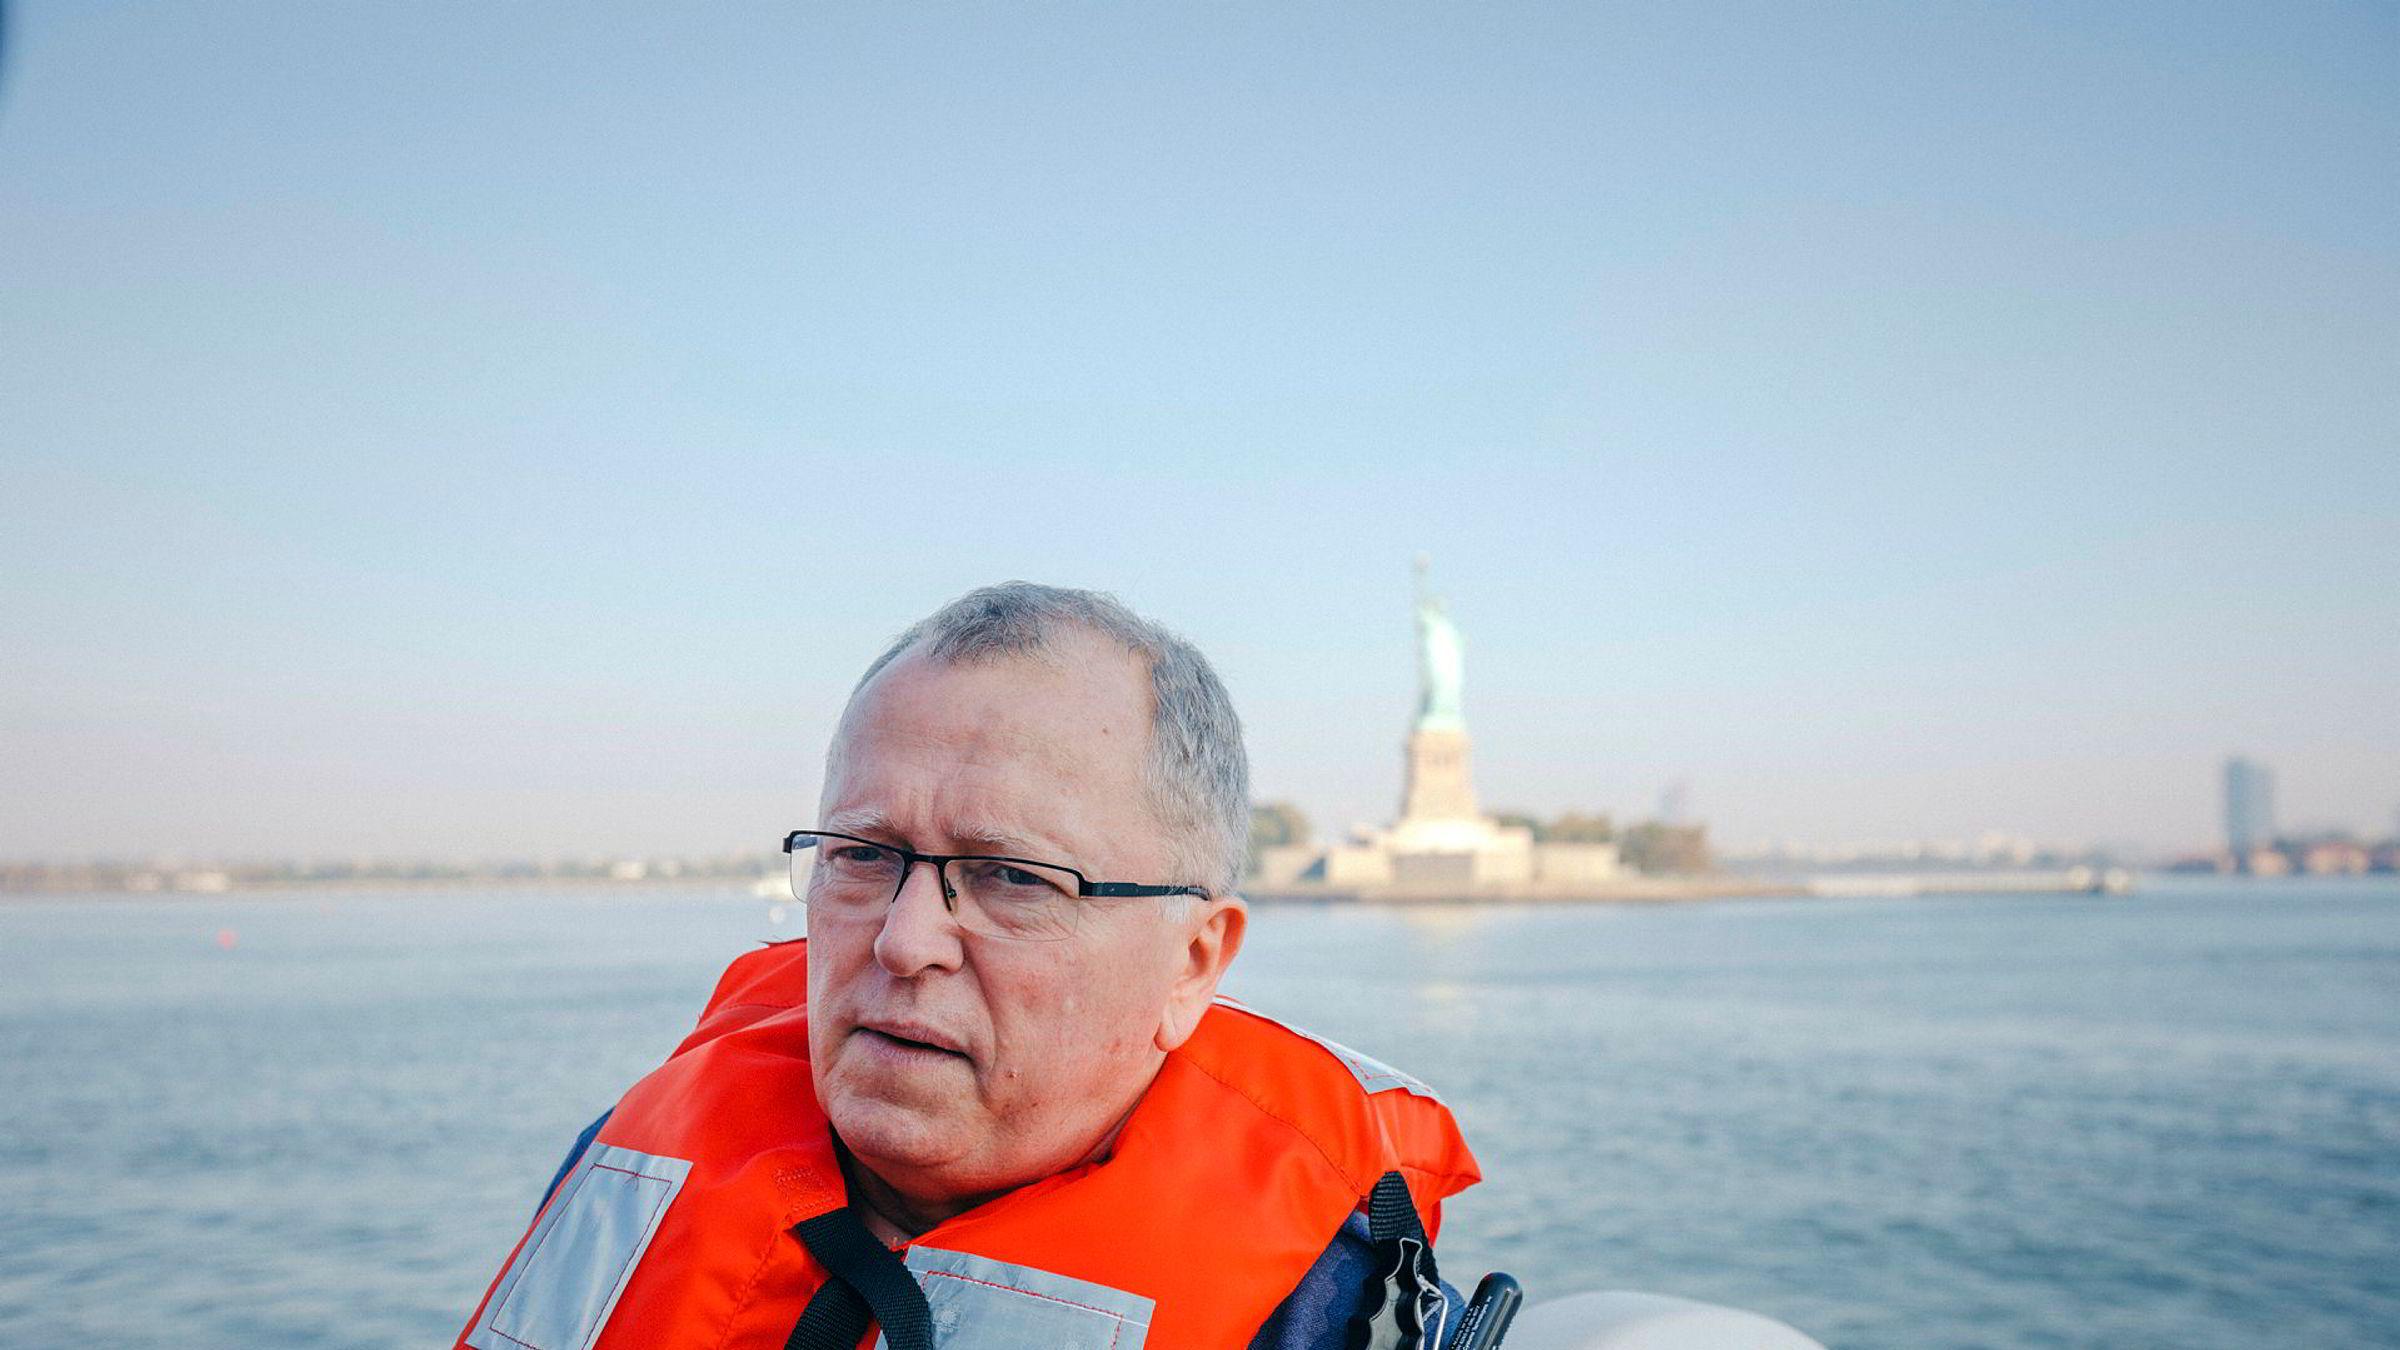 Konsernsjef Eldar Sætre i Equinor er neppe fornøyd med selskapets investeringer på land i USA. De totale nedskrivningene er på 85 milliarder kroner. Her på New York-besøk tidligere i år.